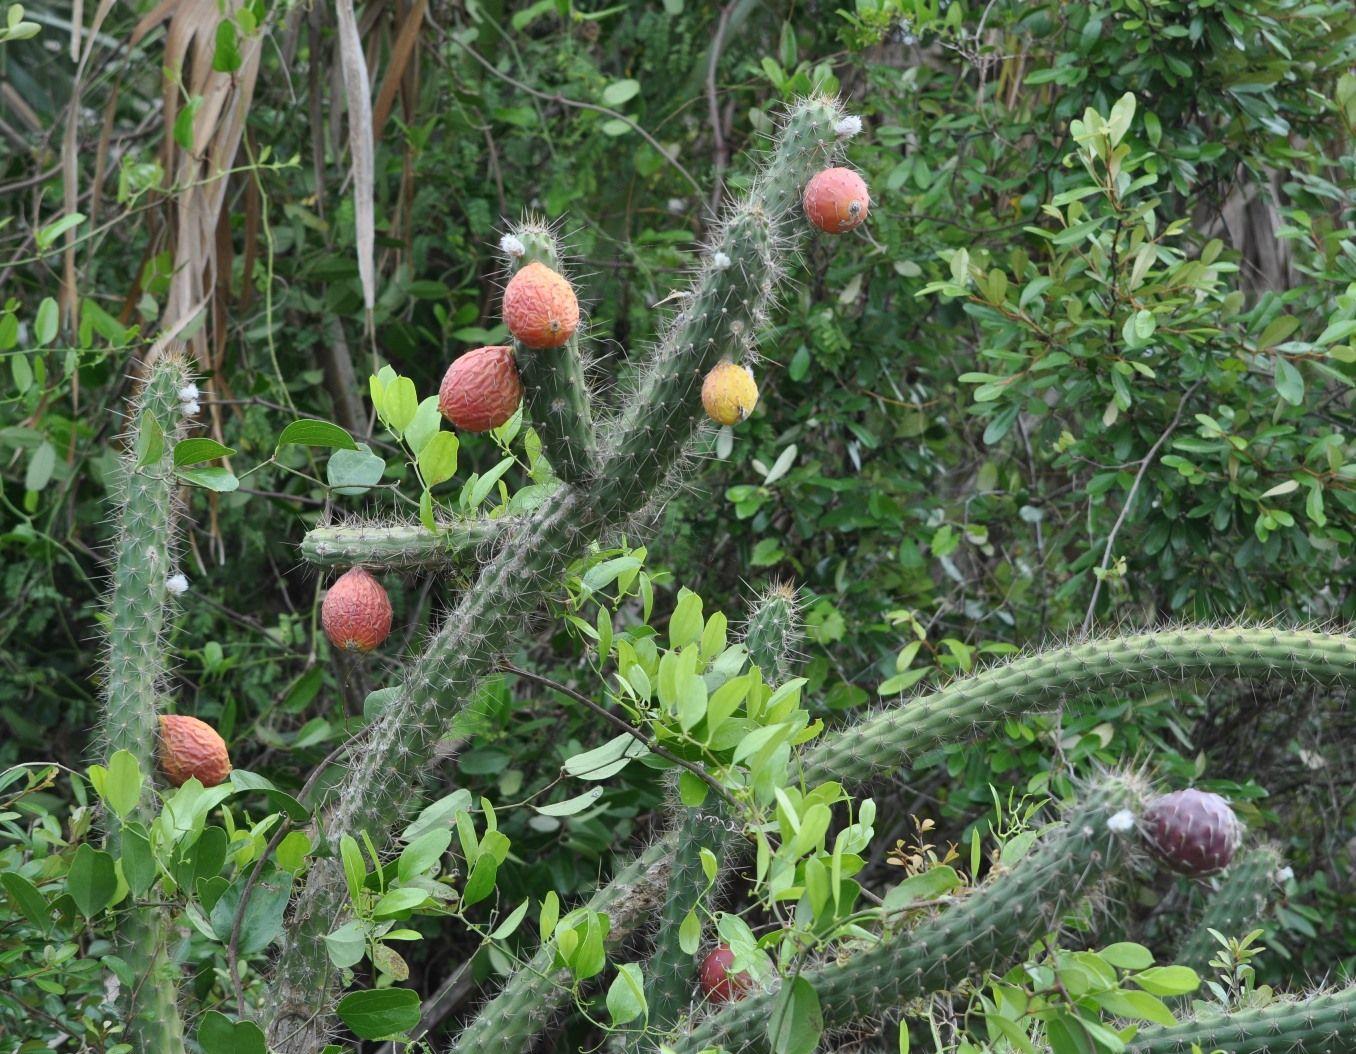 Fragrant prickly apple (Cereus eriophorus var  fragrans), a